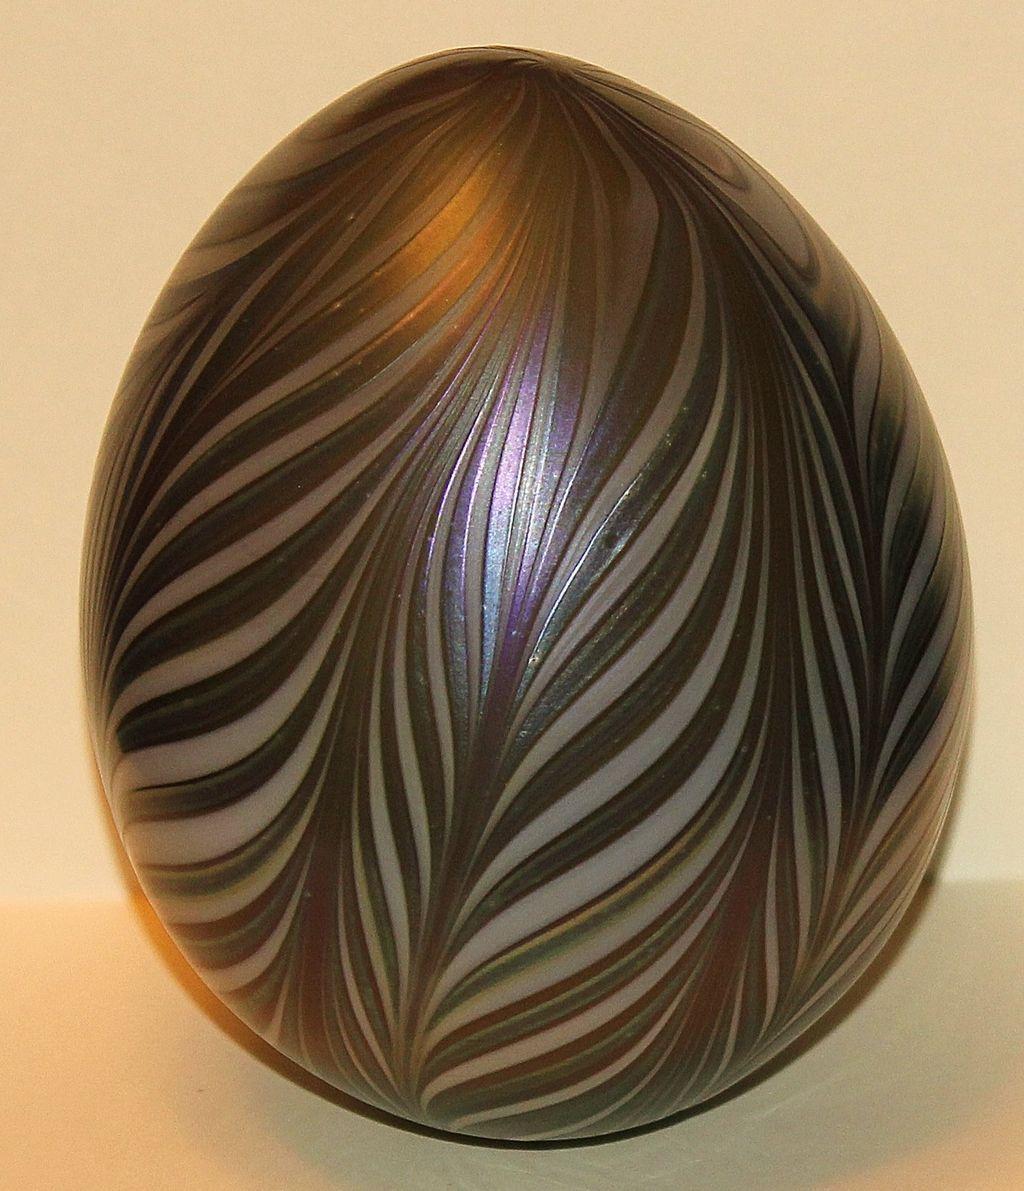 Vandermark Art Glass Egg Paperweight